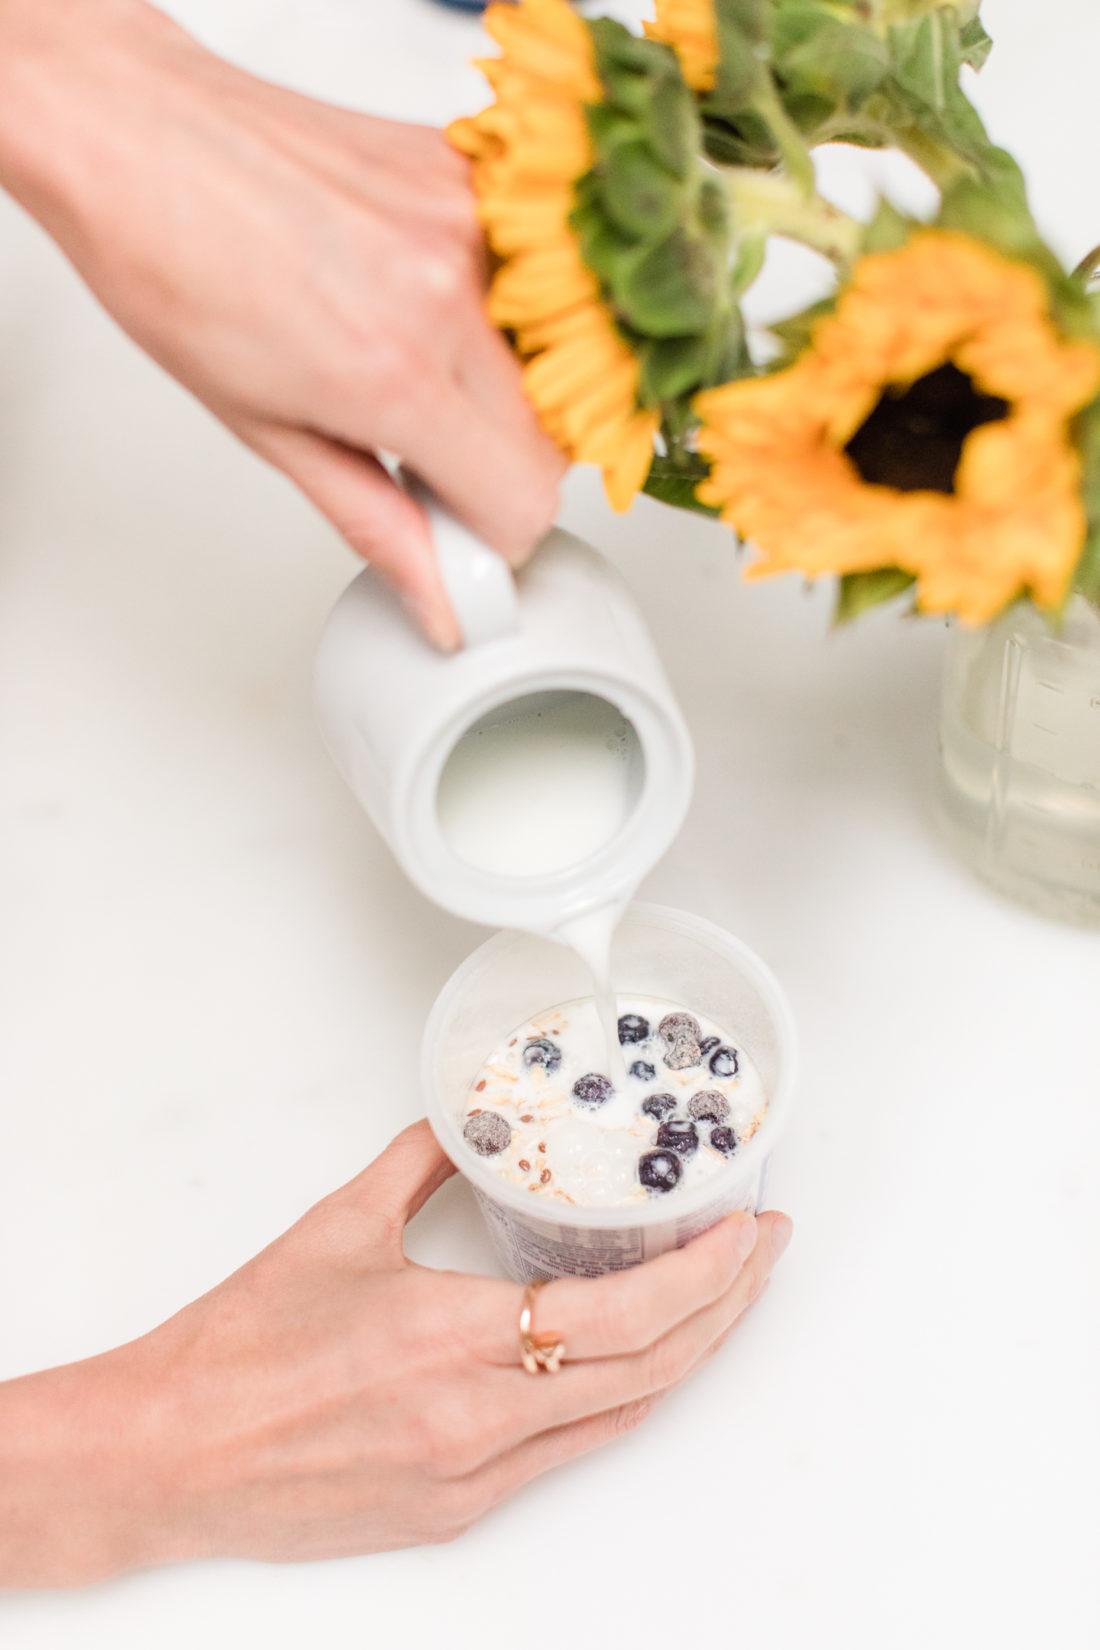 Eva Amurri Martino adds milk to a container of Quaker Overnight Oats